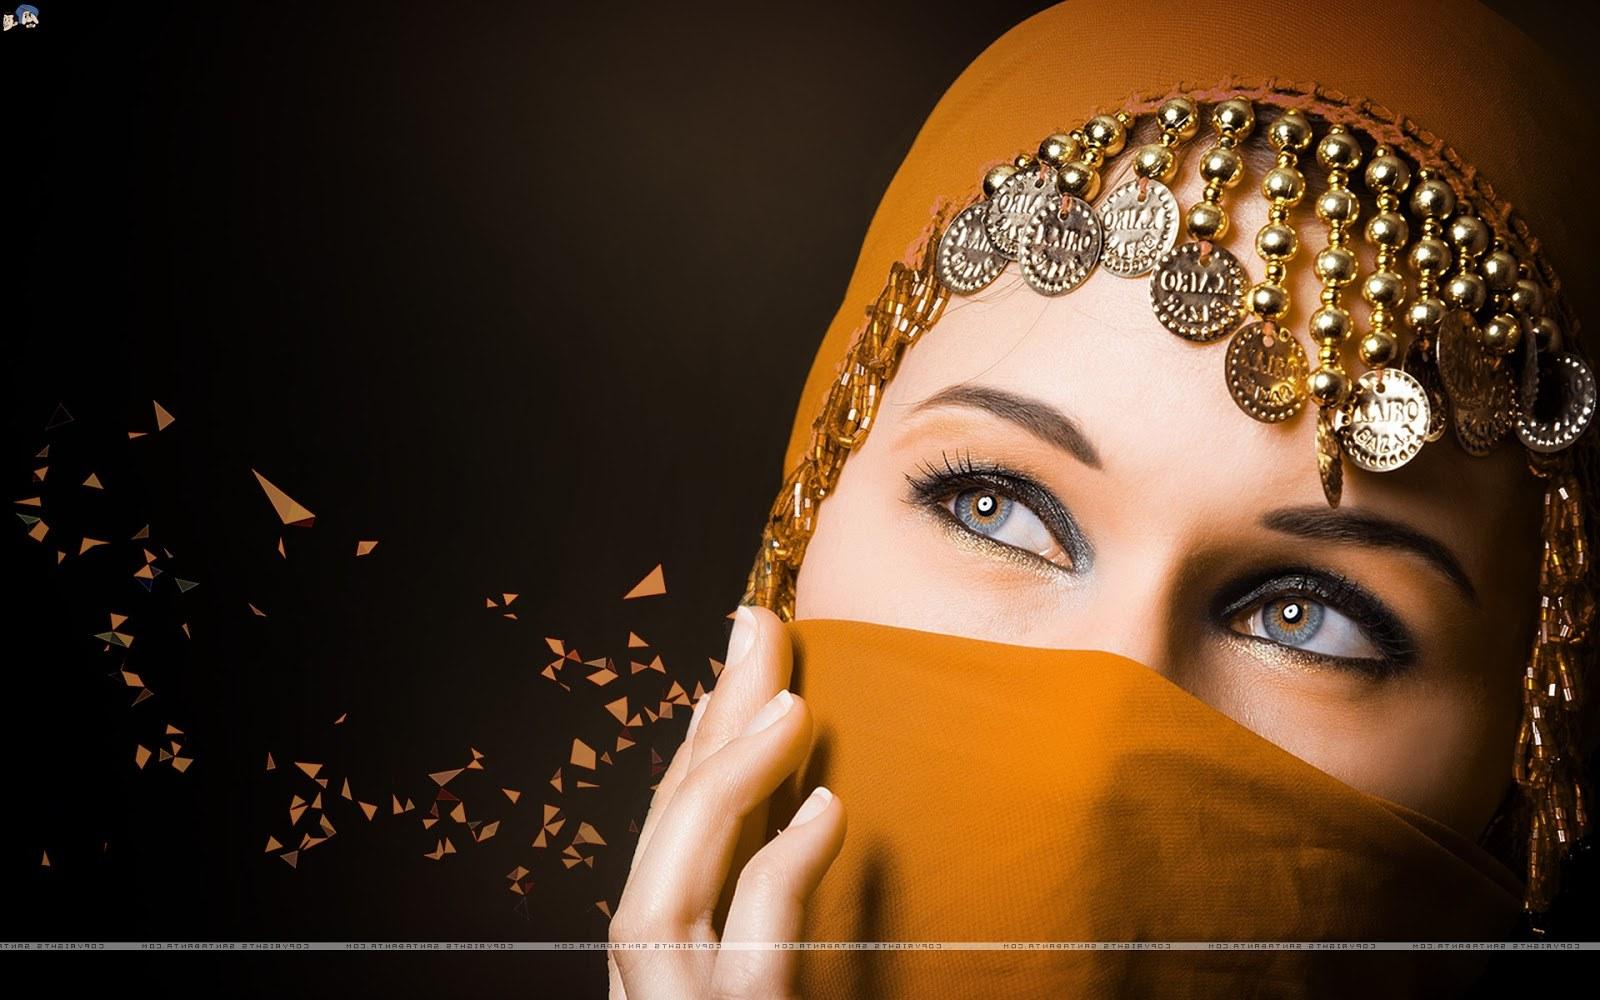 Bentuk Muslimah Bercadar Hitam Gdd0 Koleksi Wallpaper Wanita Muslimah Bercadar